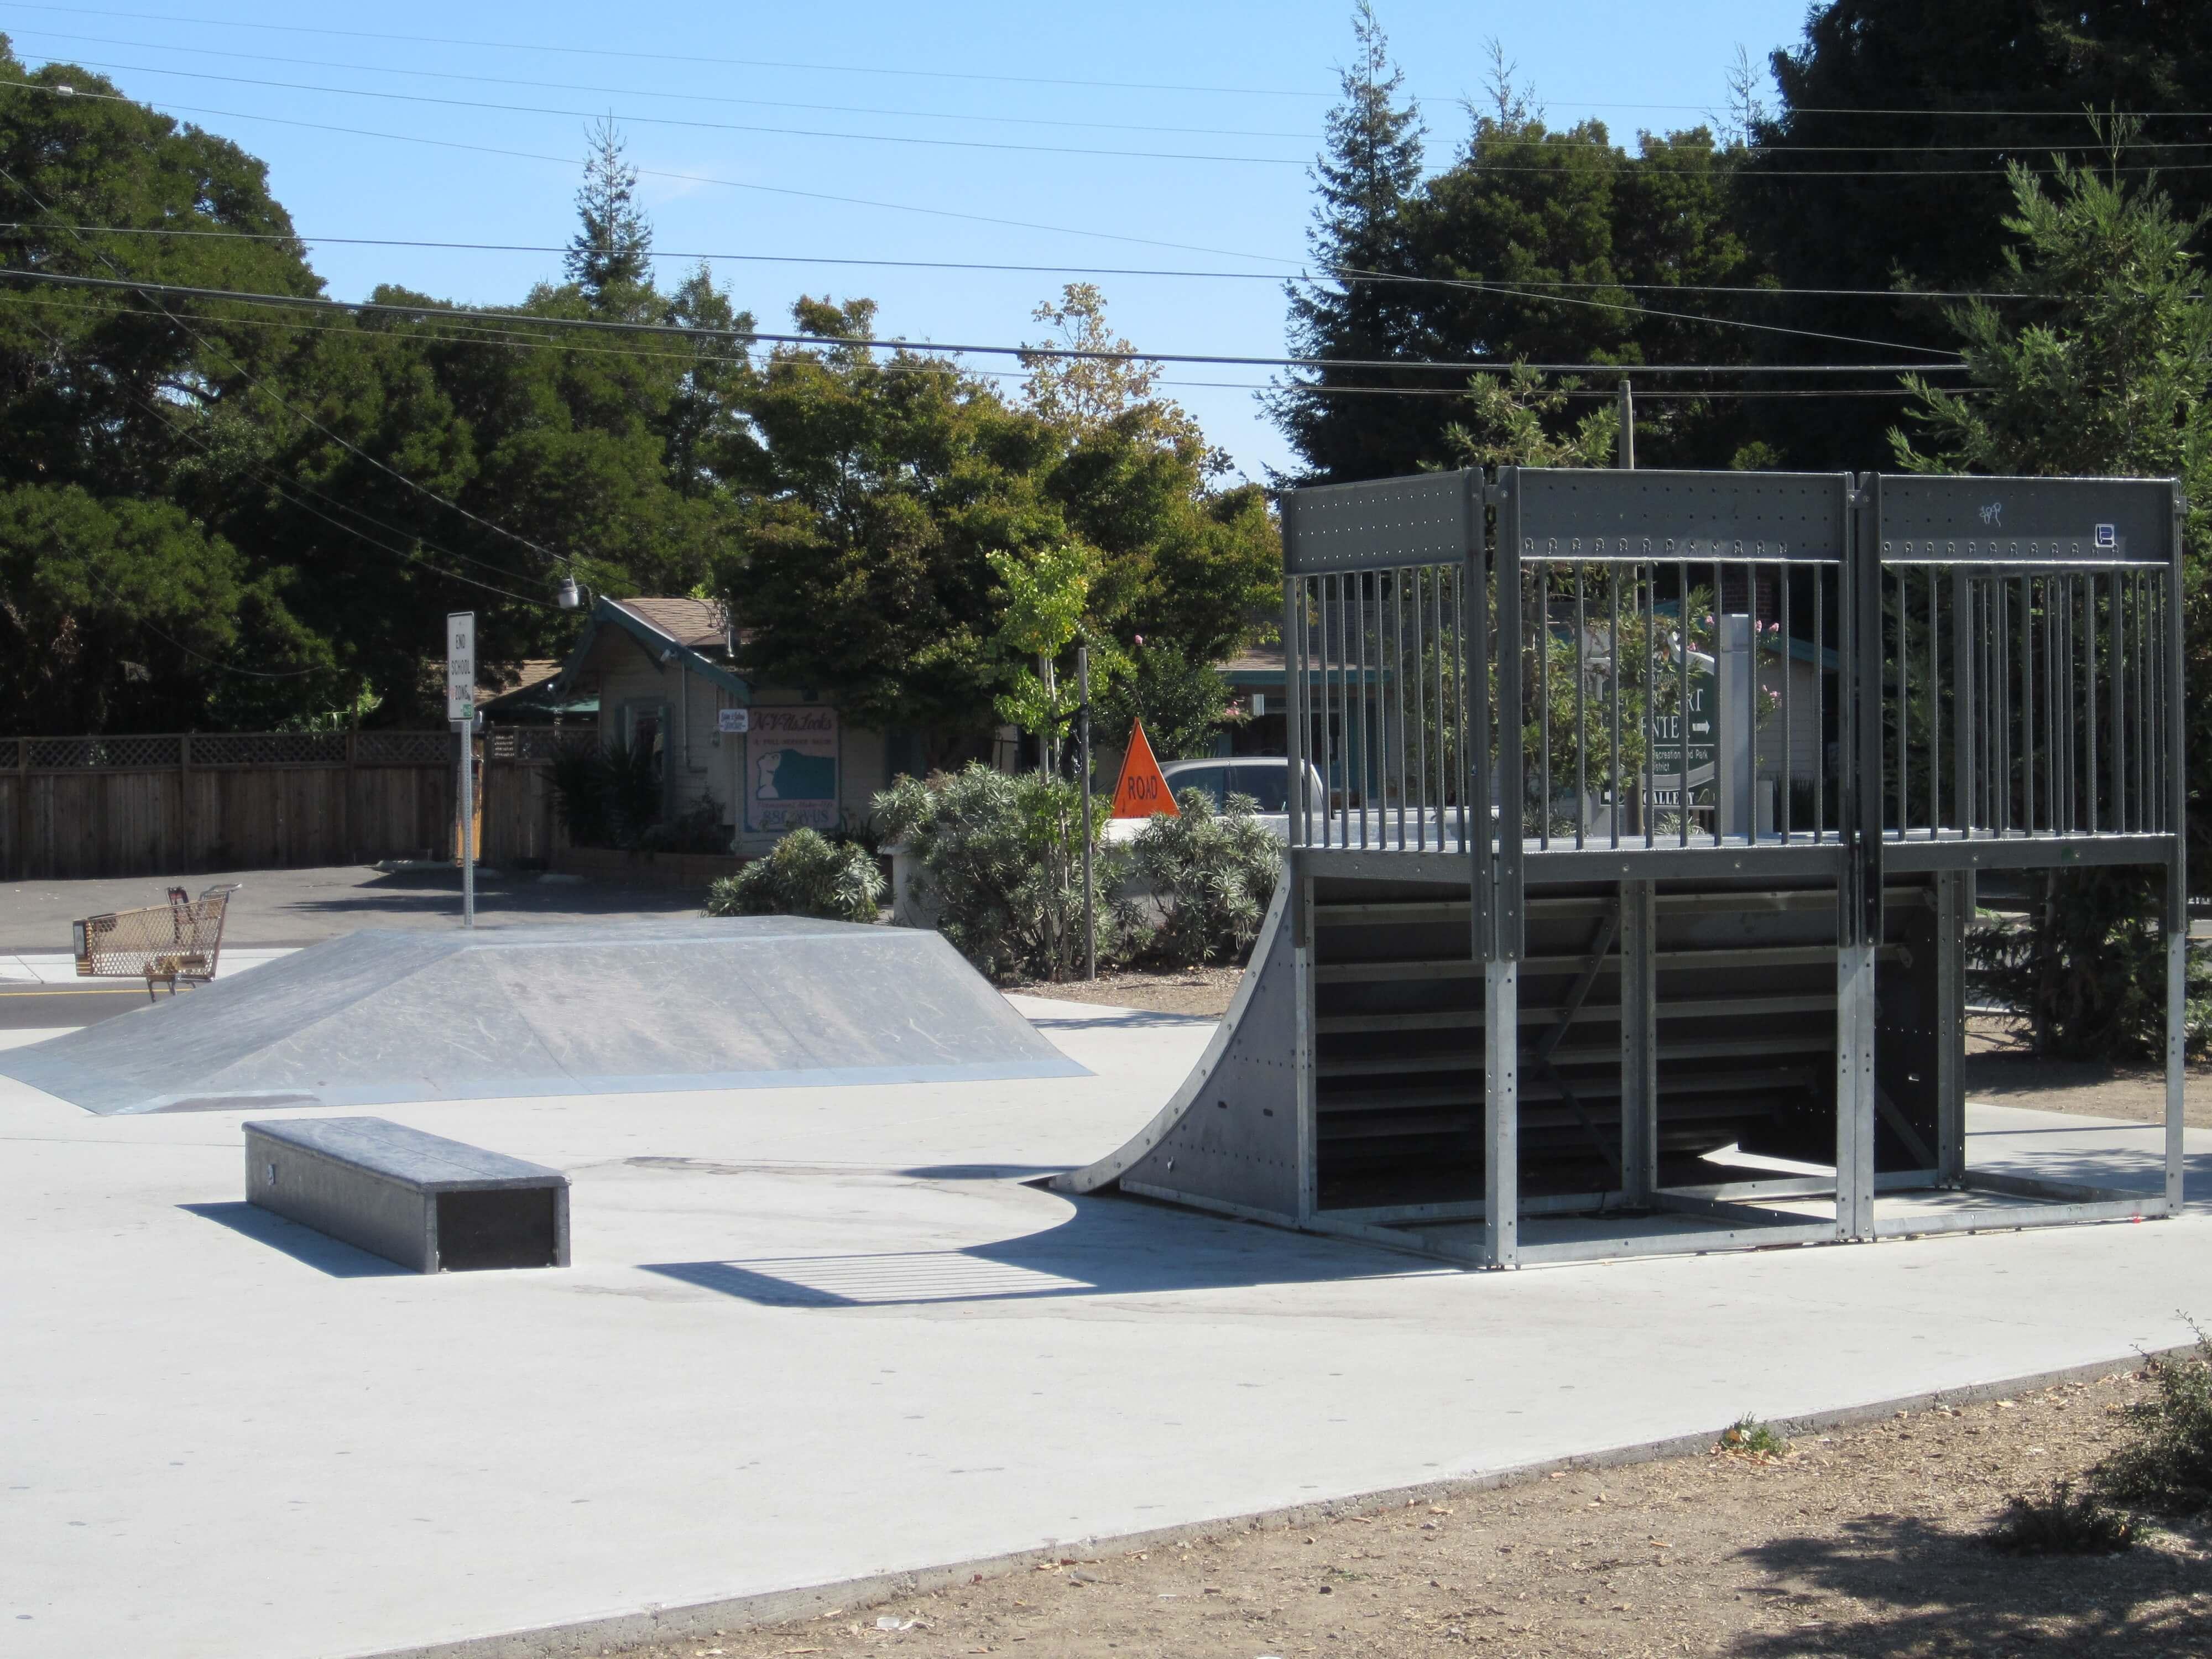 adobe park skatepark, castro valley, california